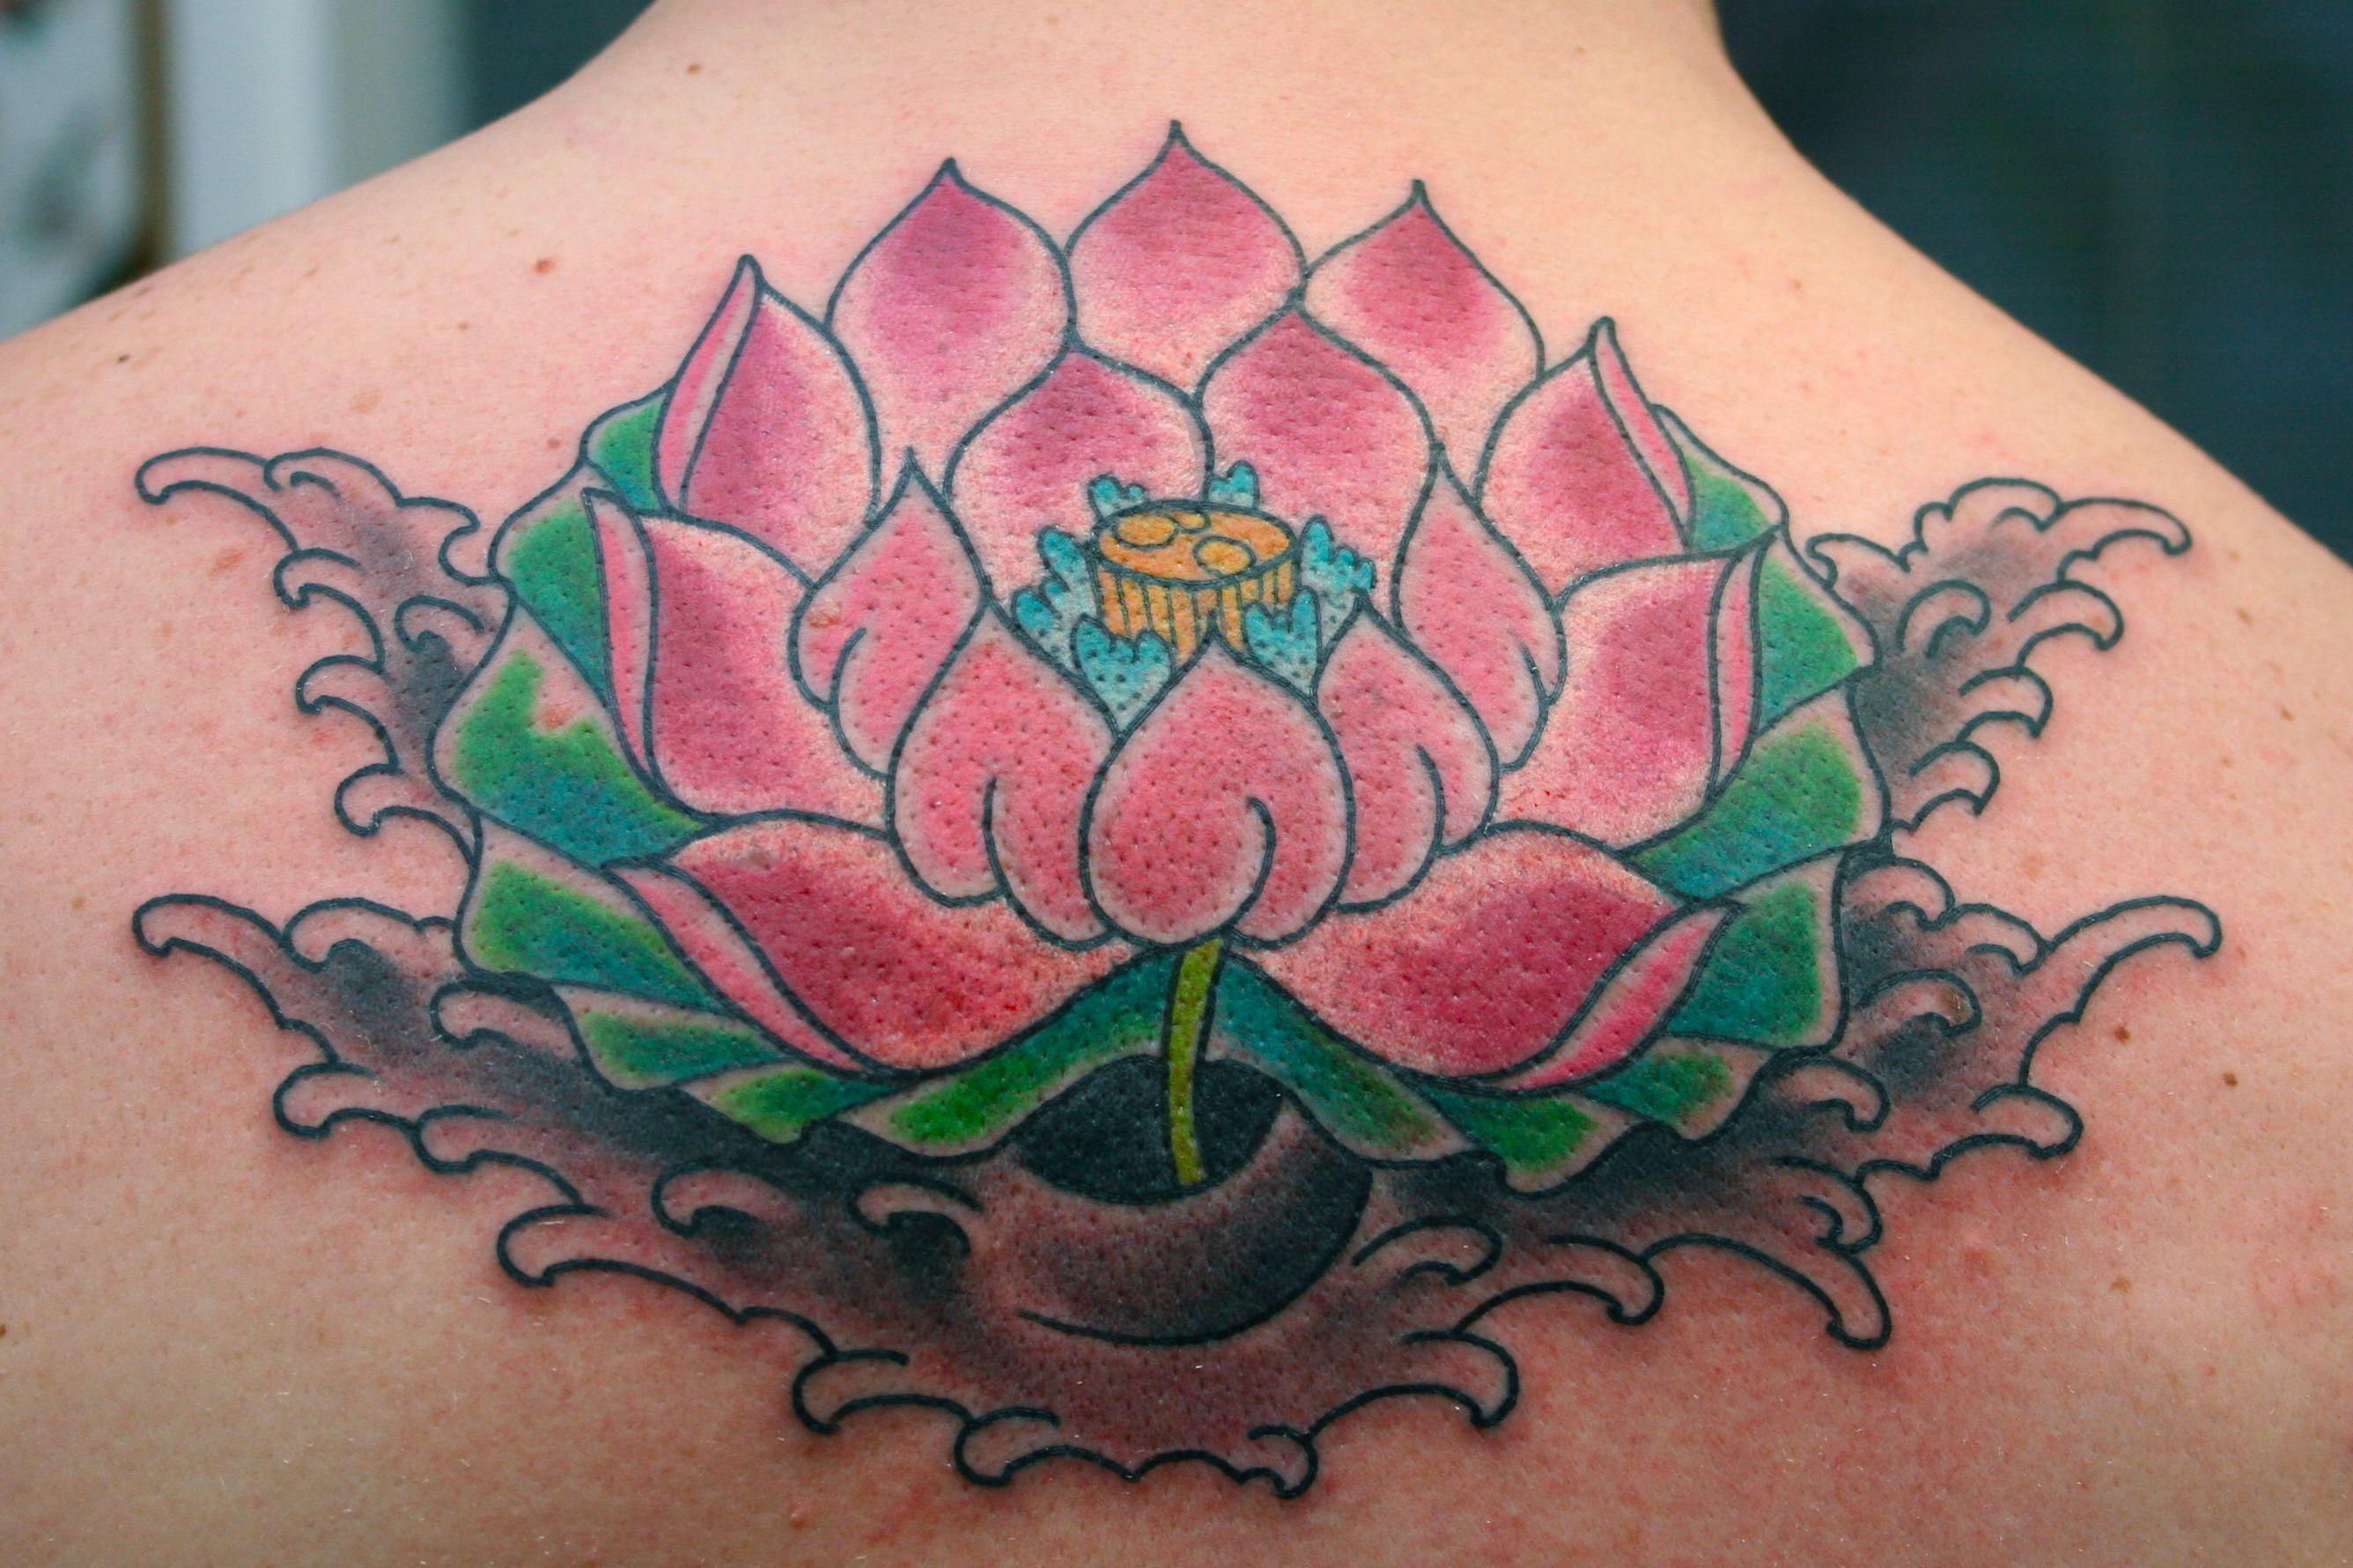 Lotus flower tattoos for men pinterest flower tattoos lotus lotus flower tattoo tattoos ideas designs men formen menstattooideas izmirmasajfo